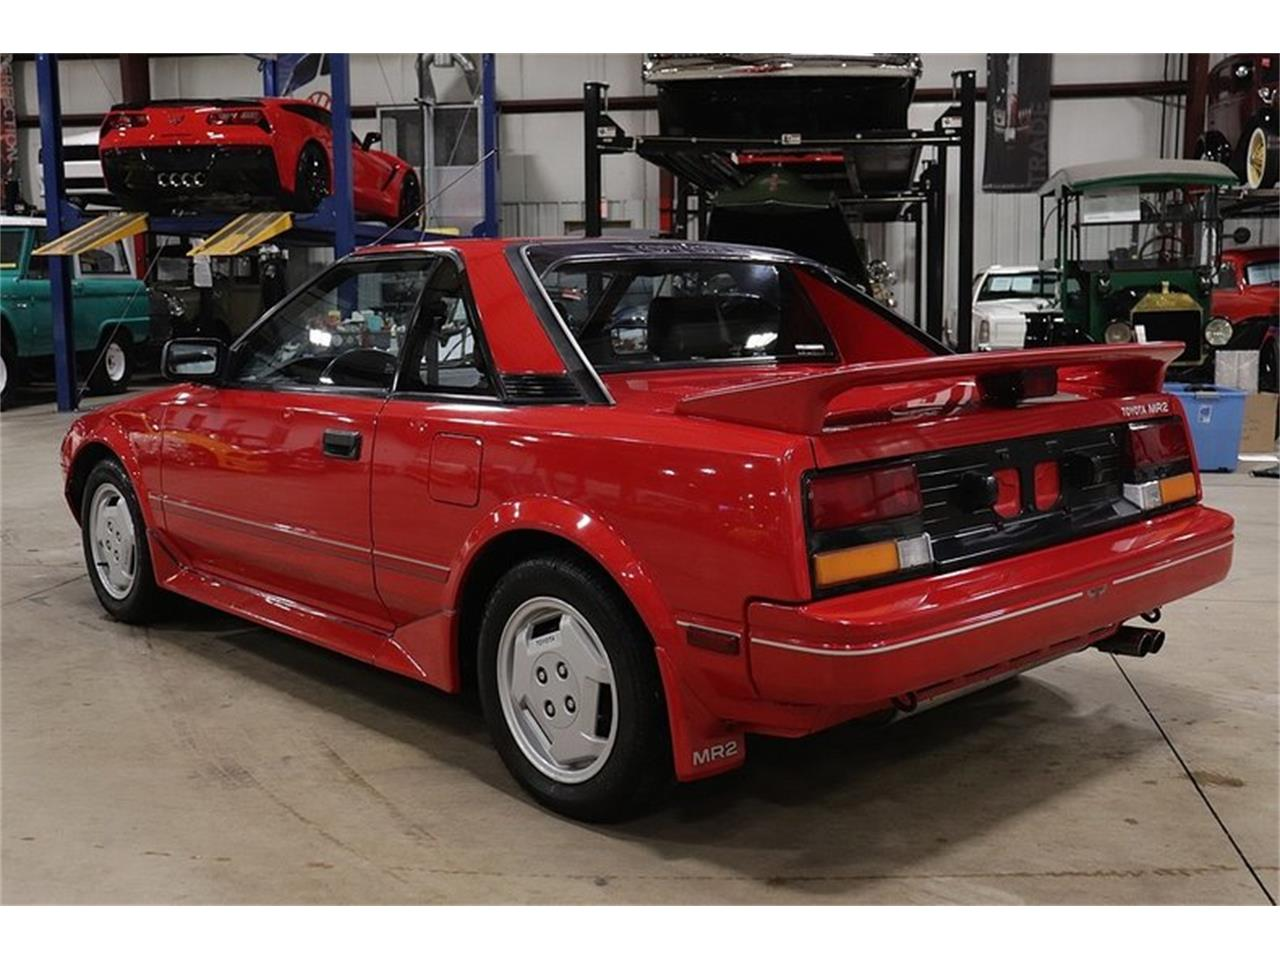 1986 toyota mr2 for sale classiccars cc 1162508